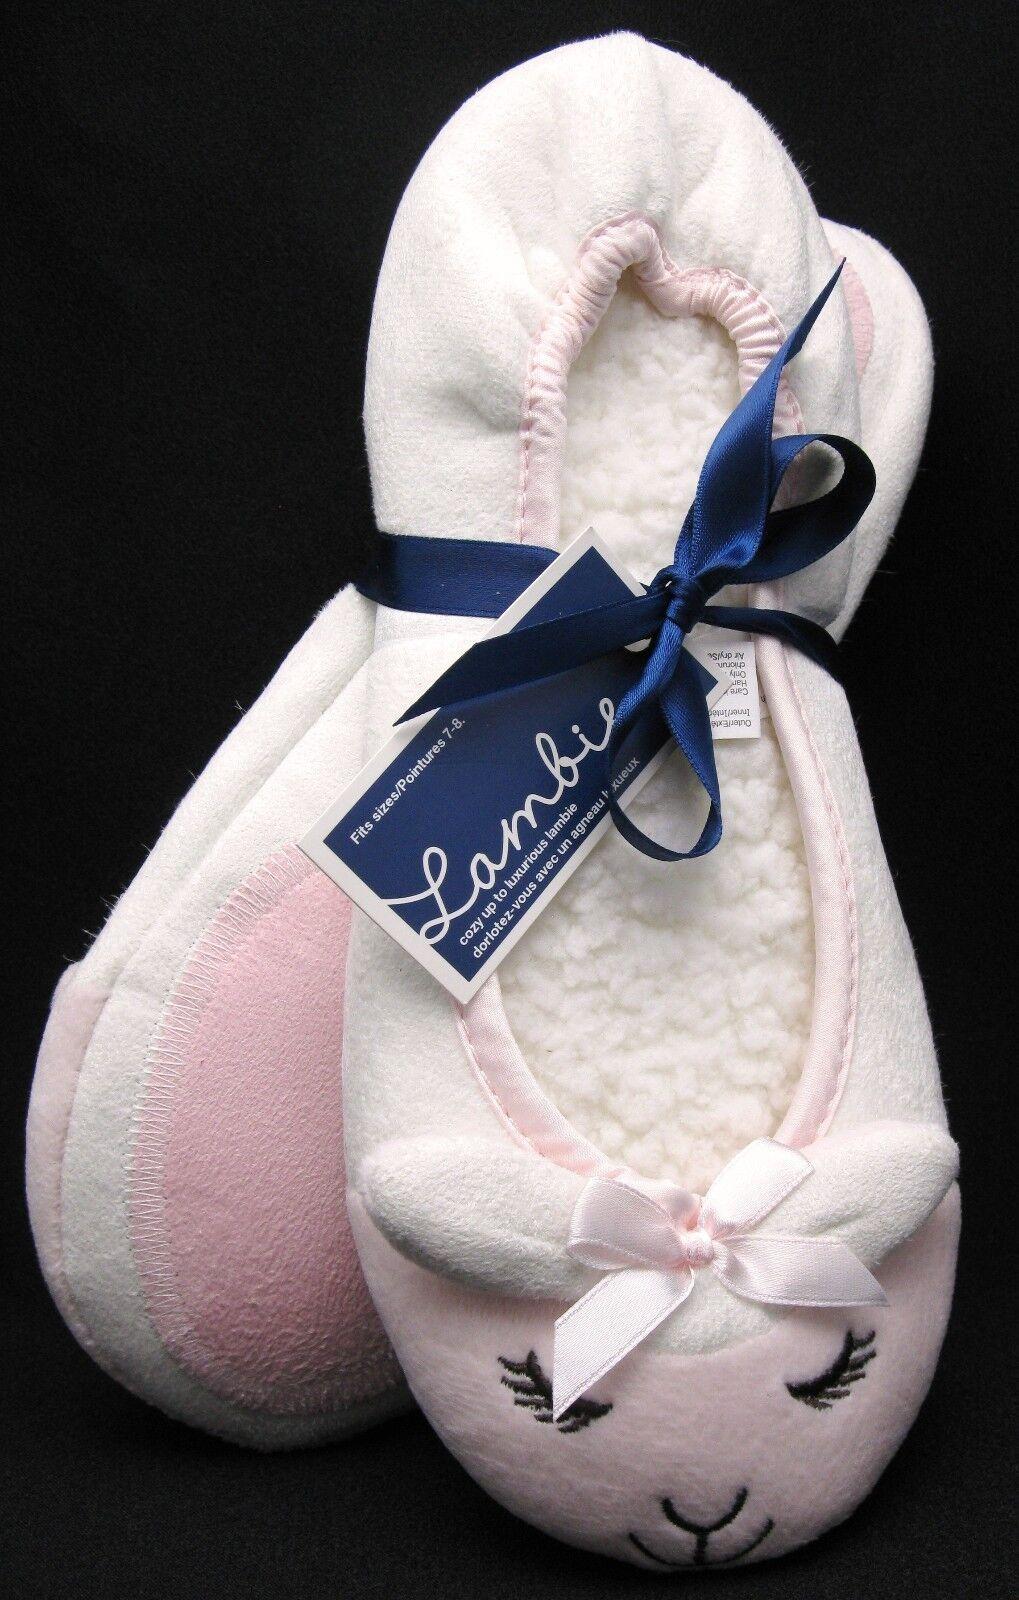 Bath & Body Works LAMBIE Ballerina Ballet Slippers 7-8 Small Medium New w Tag